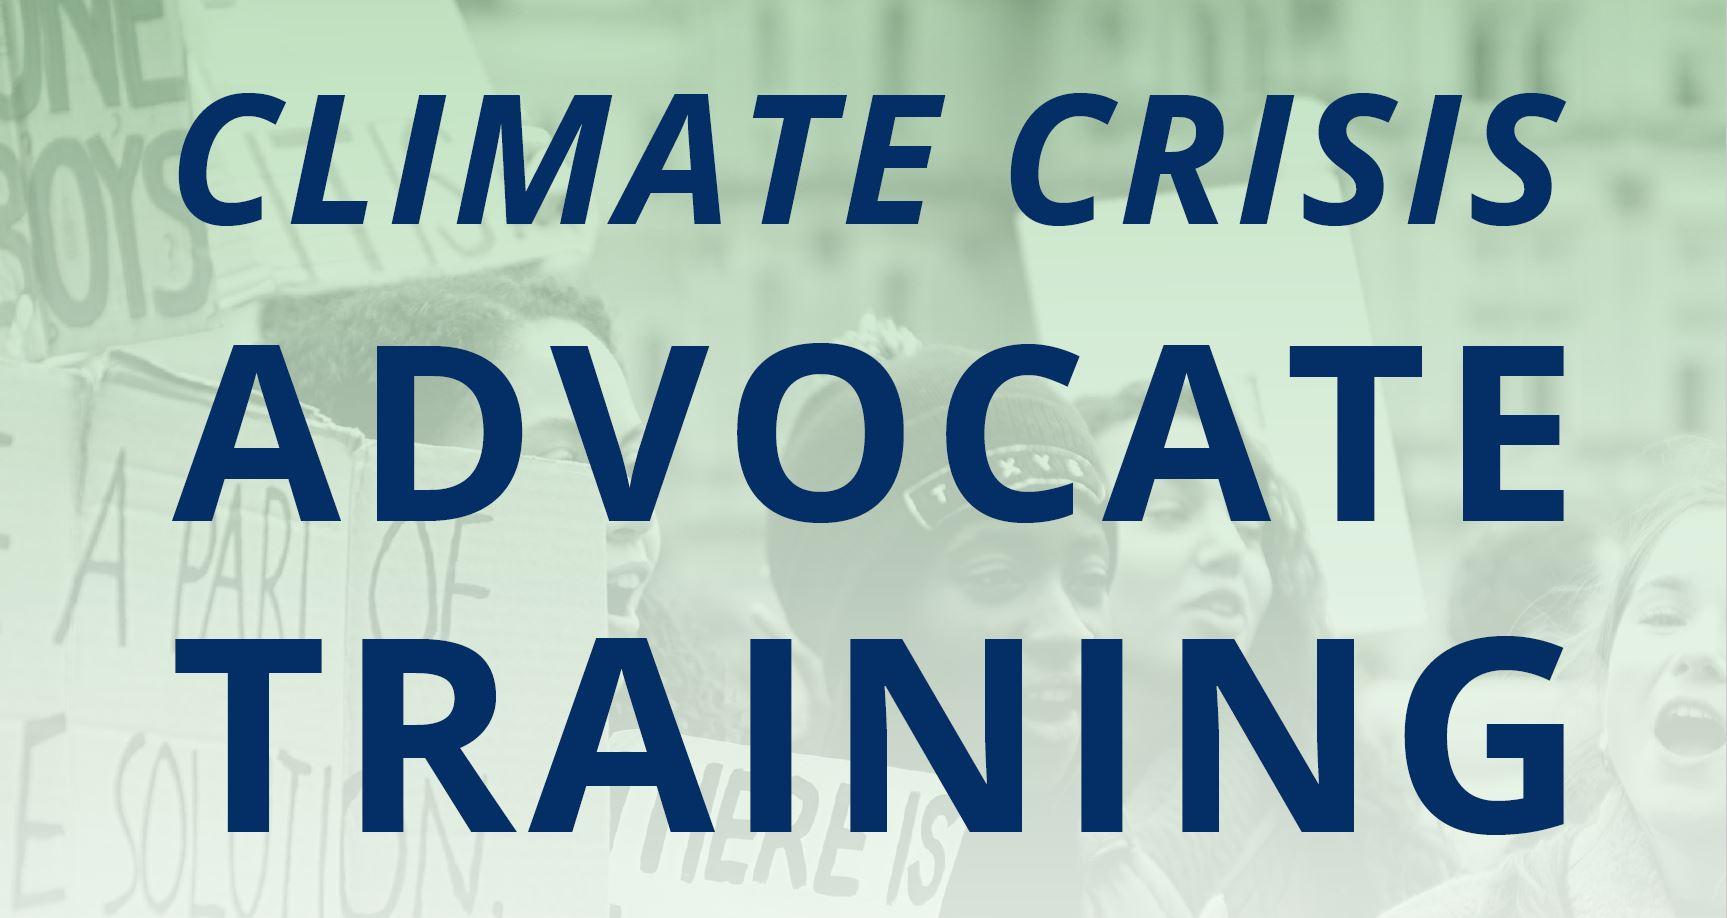 Advocate_training_banner